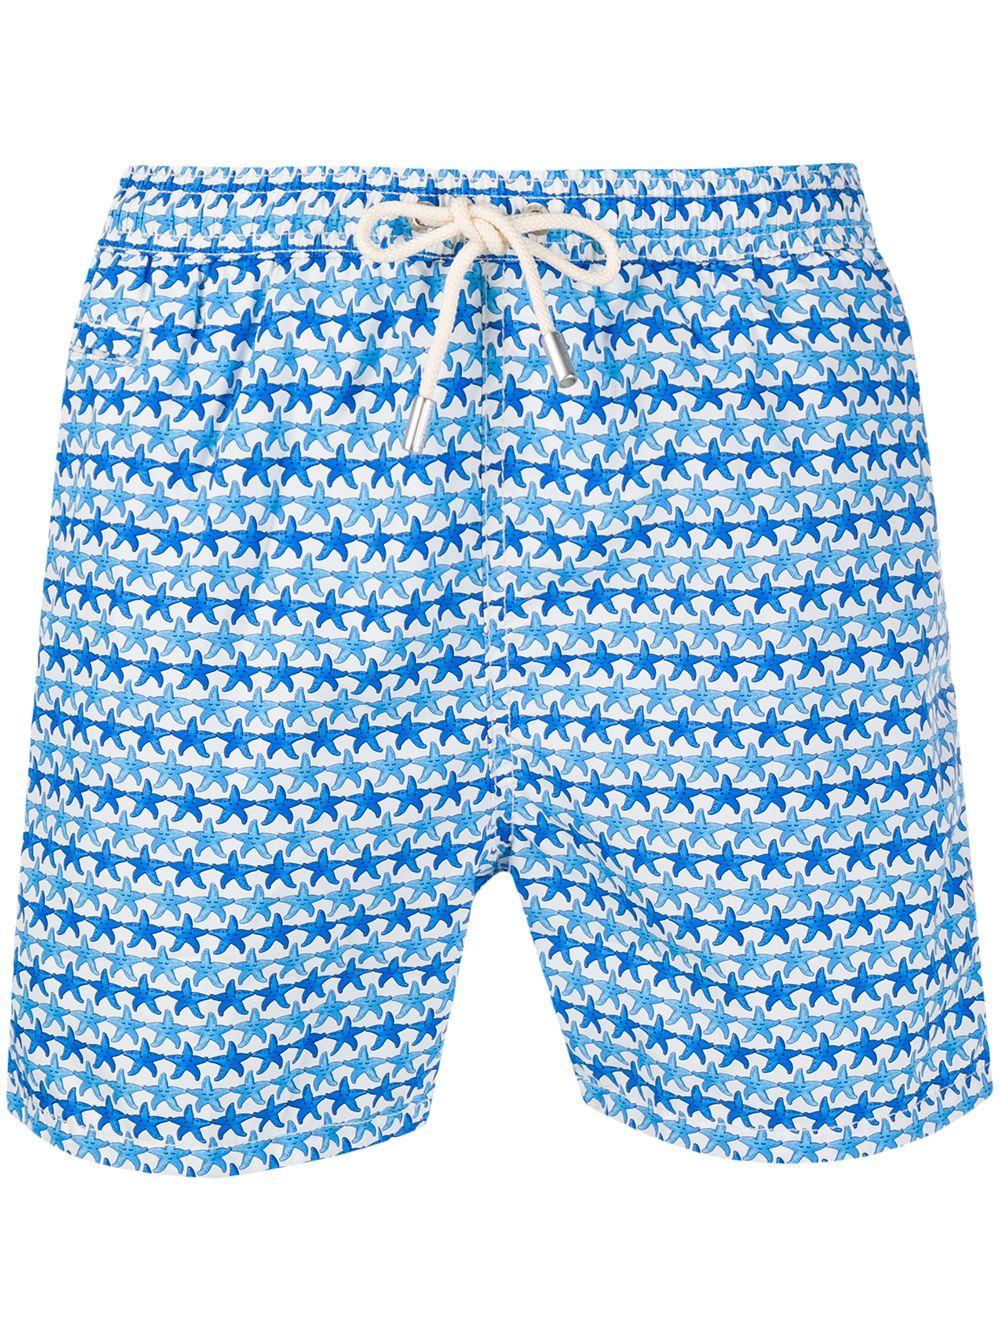 Blue and white recycled polyester starfish print swim shorts MC2 |  | LIGHTING MICRO FANTASY-FRIENDLY STARFISH01